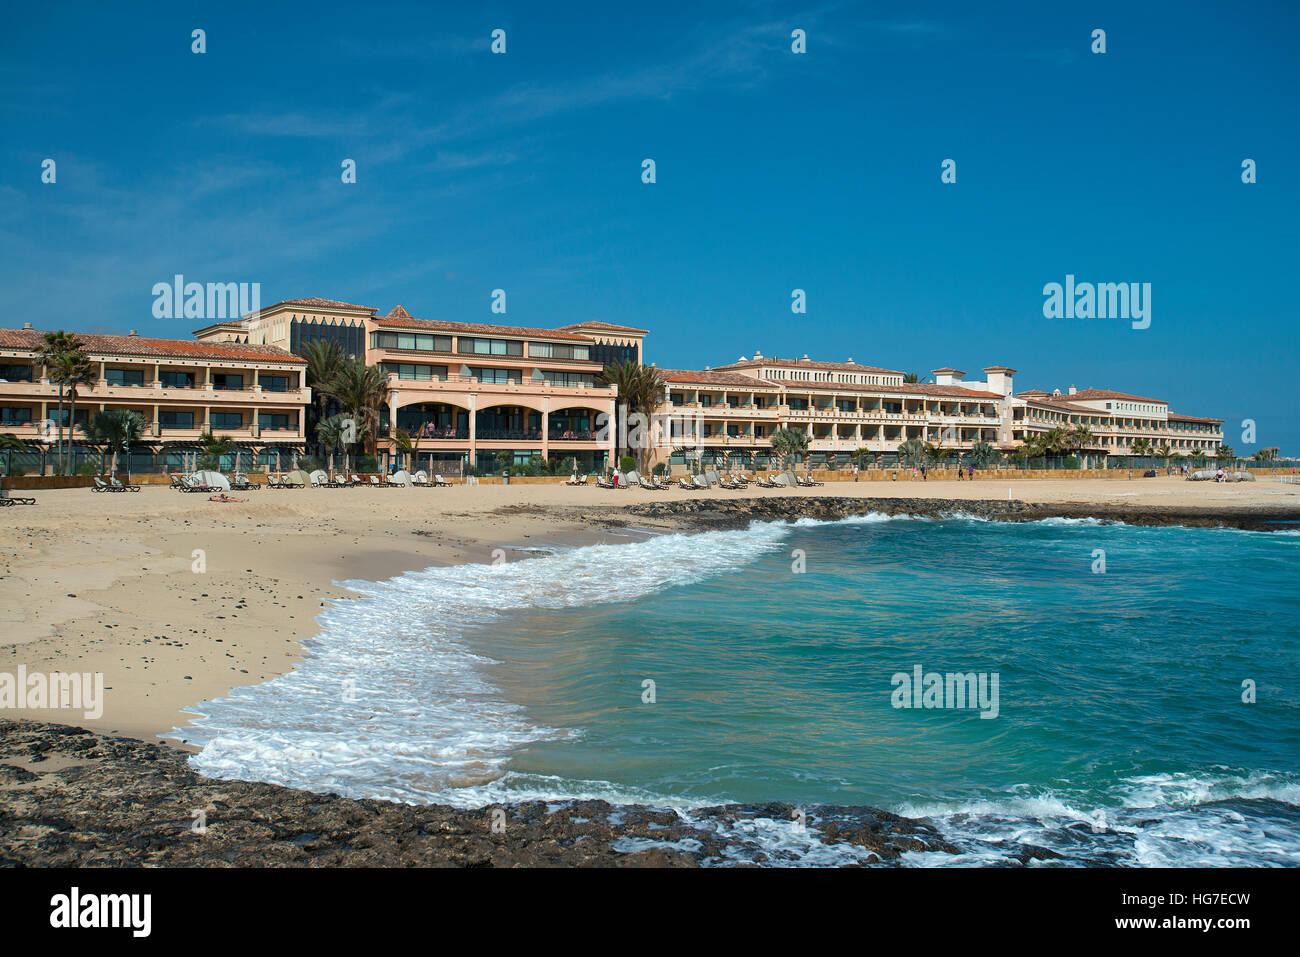 Strand Mit Gran Hotel Atlantis Bahia Real Corralejo Fuerteventura